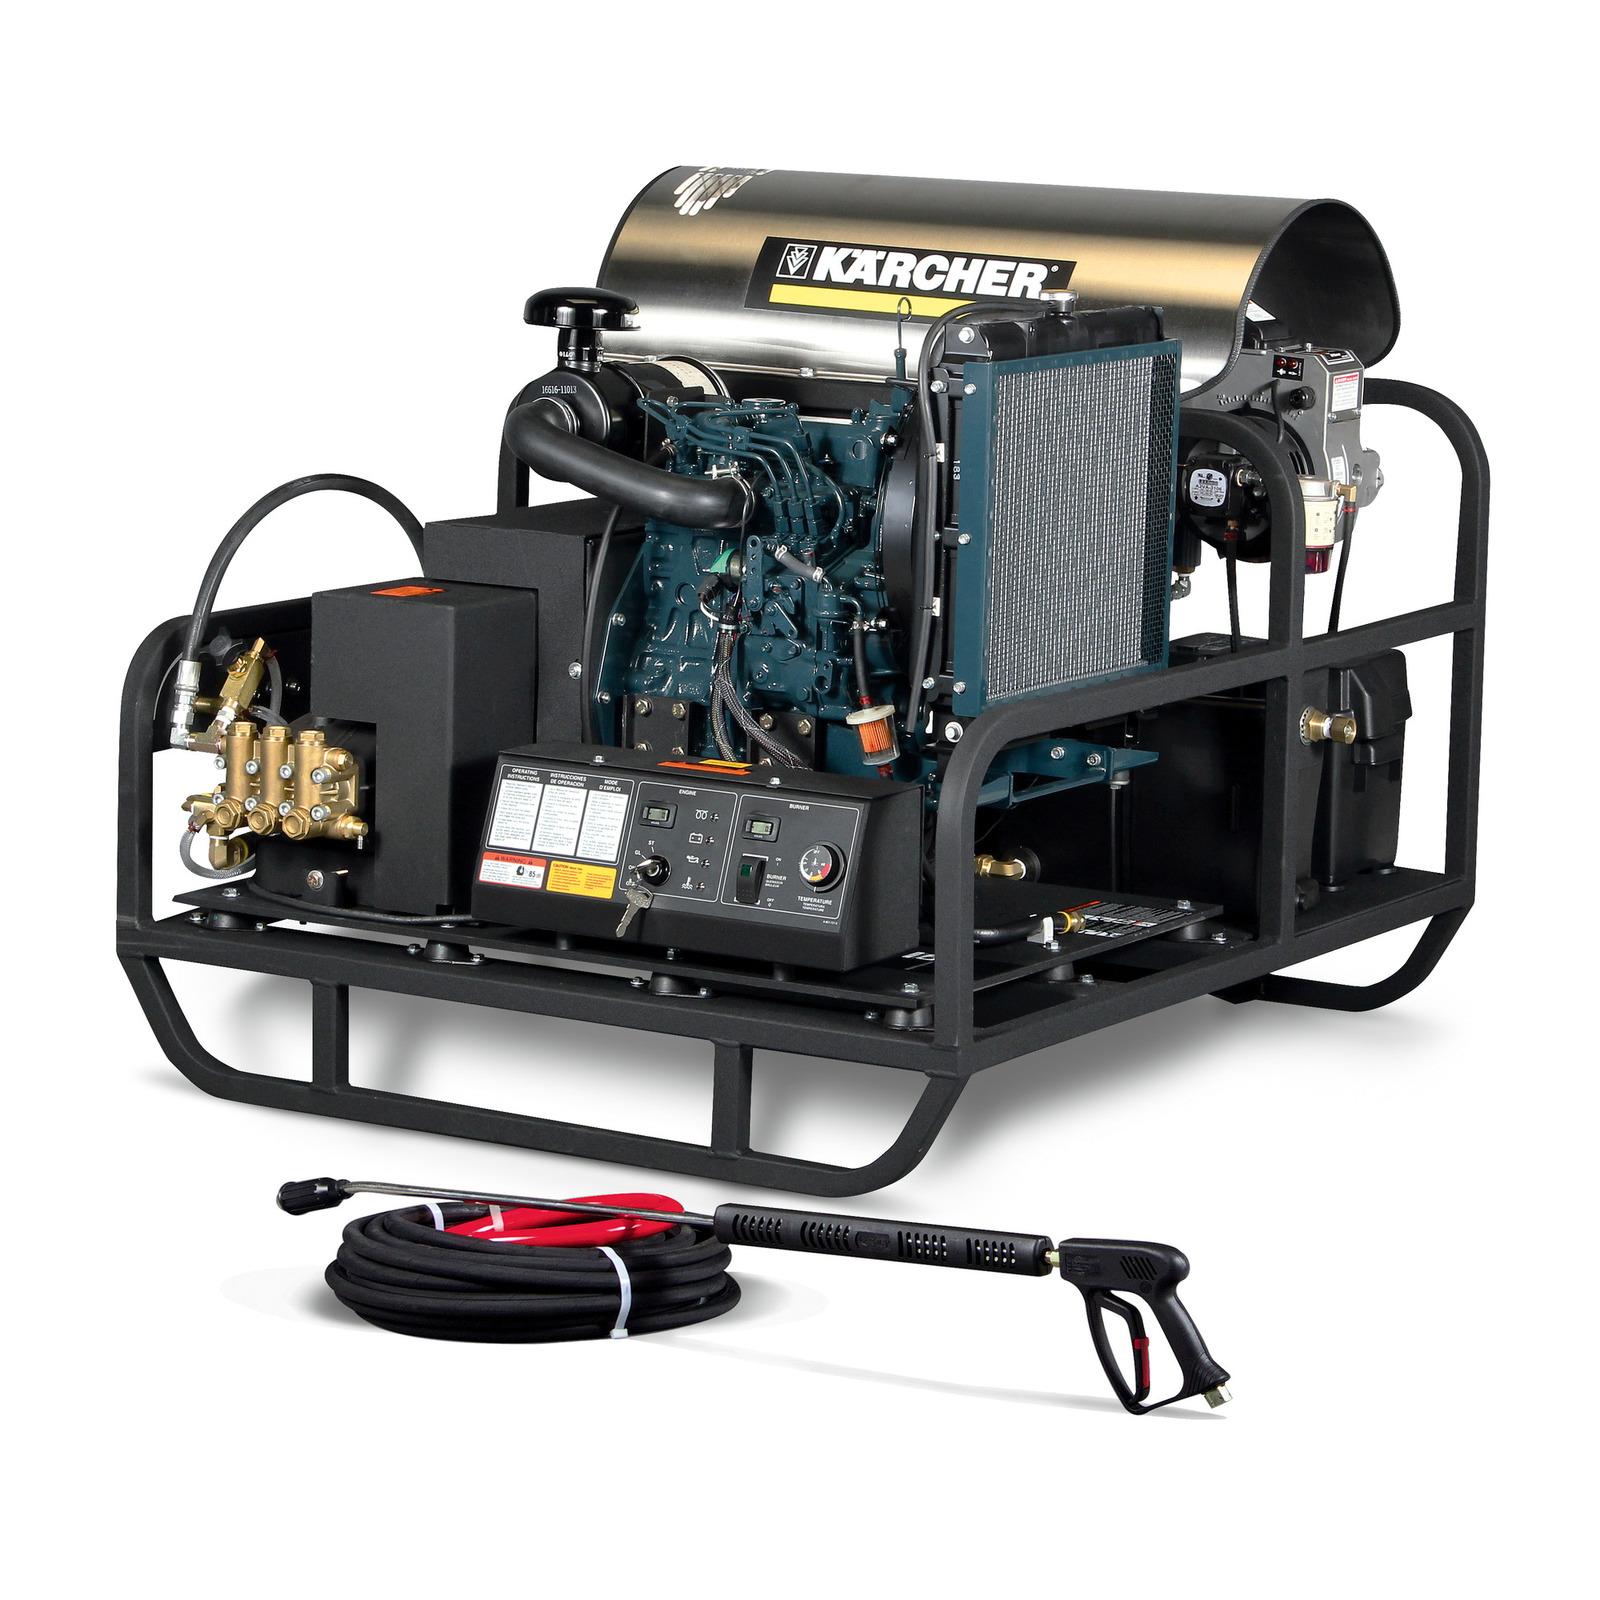 Hot Water Pressure Washer Hds De Cage Karcher